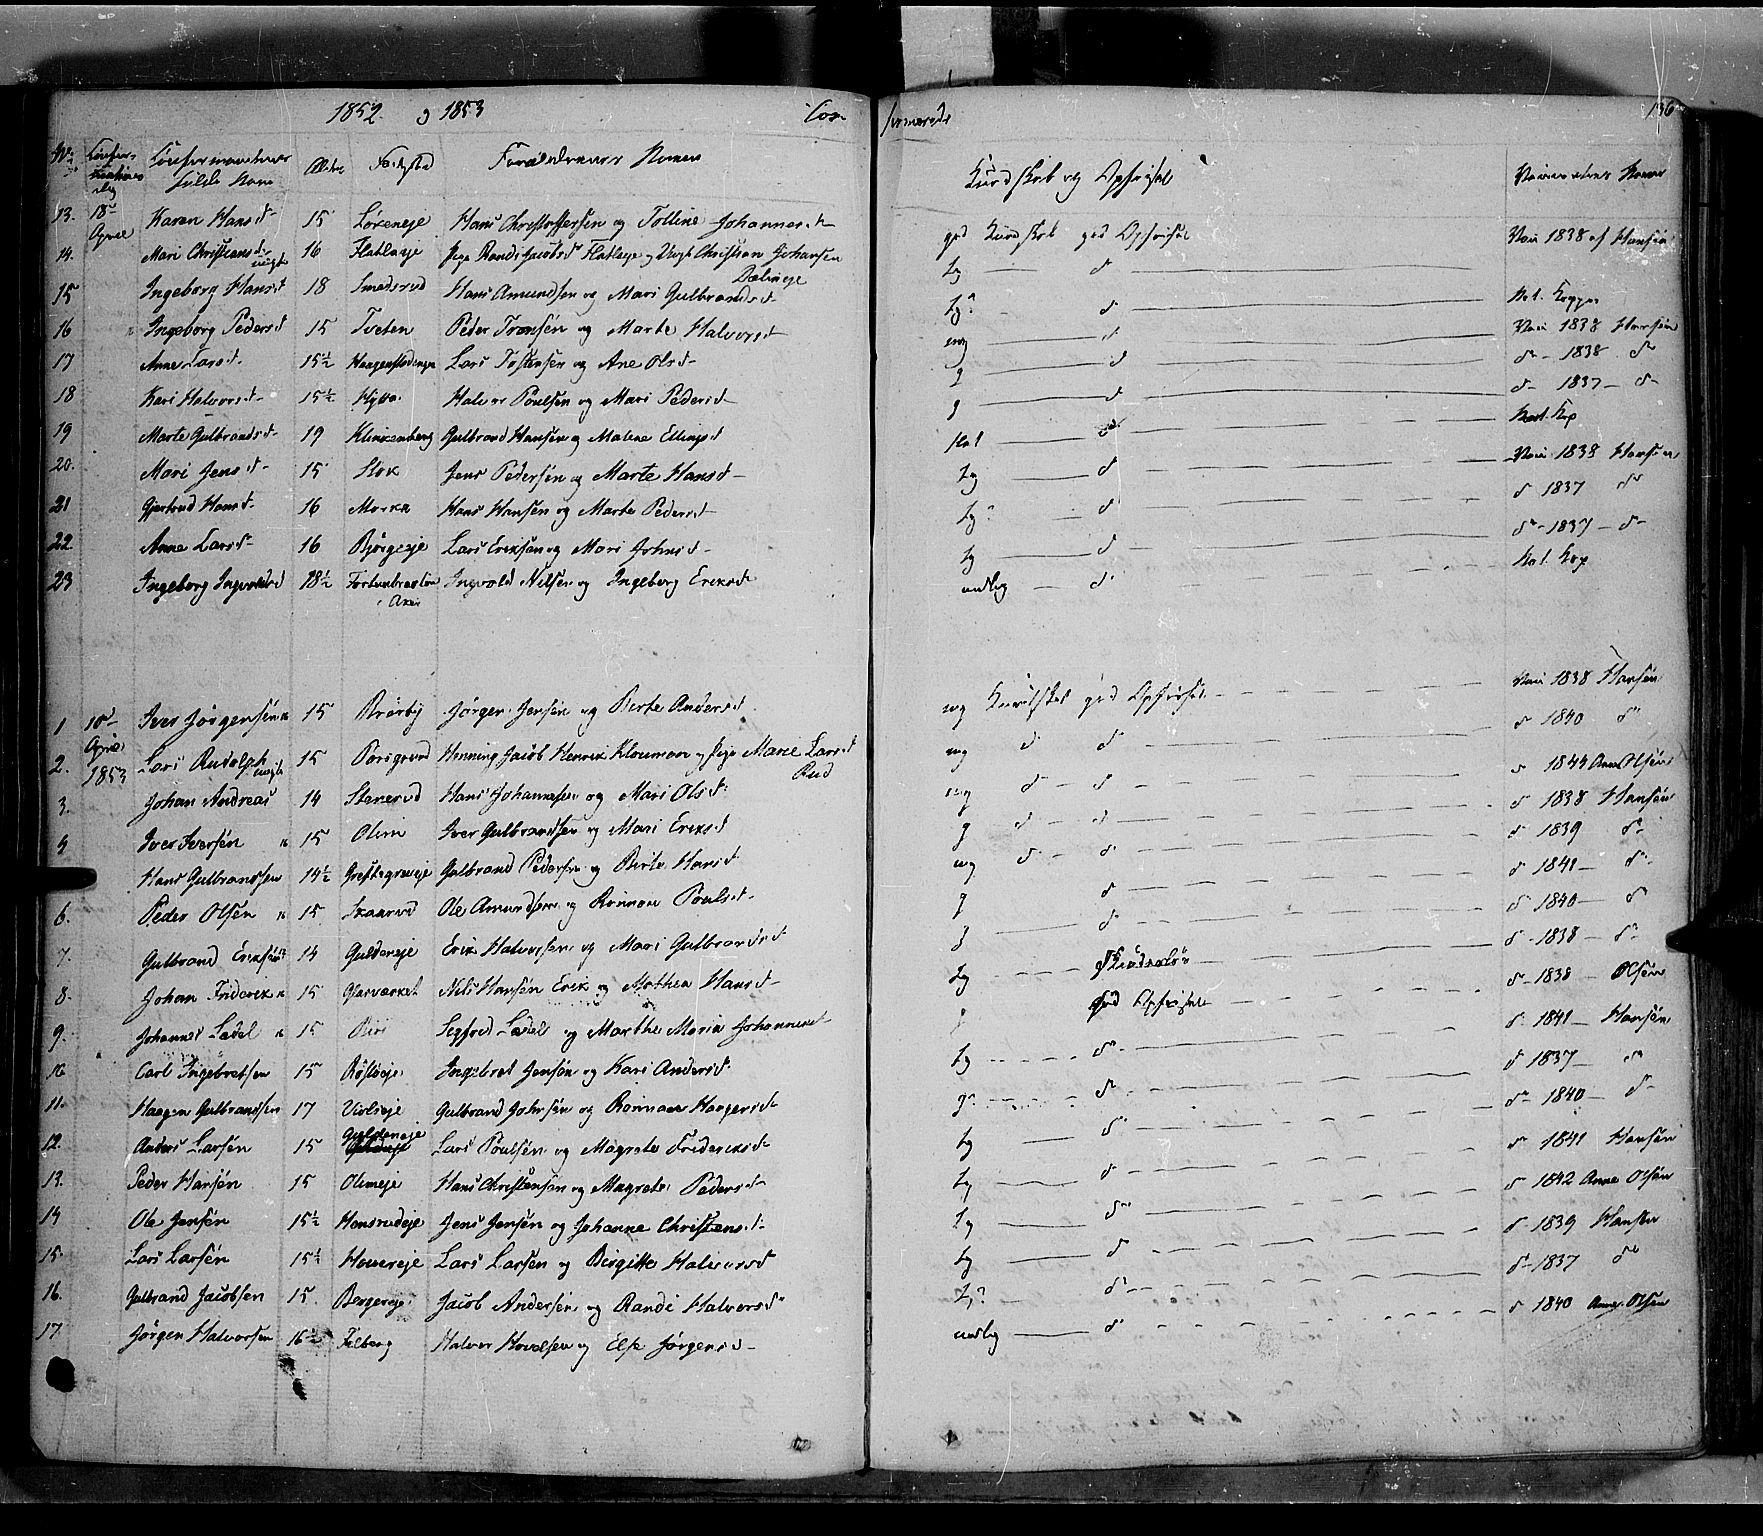 SAH, Jevnaker prestekontor, Ministerialbok nr. 6, 1837-1857, s. 136